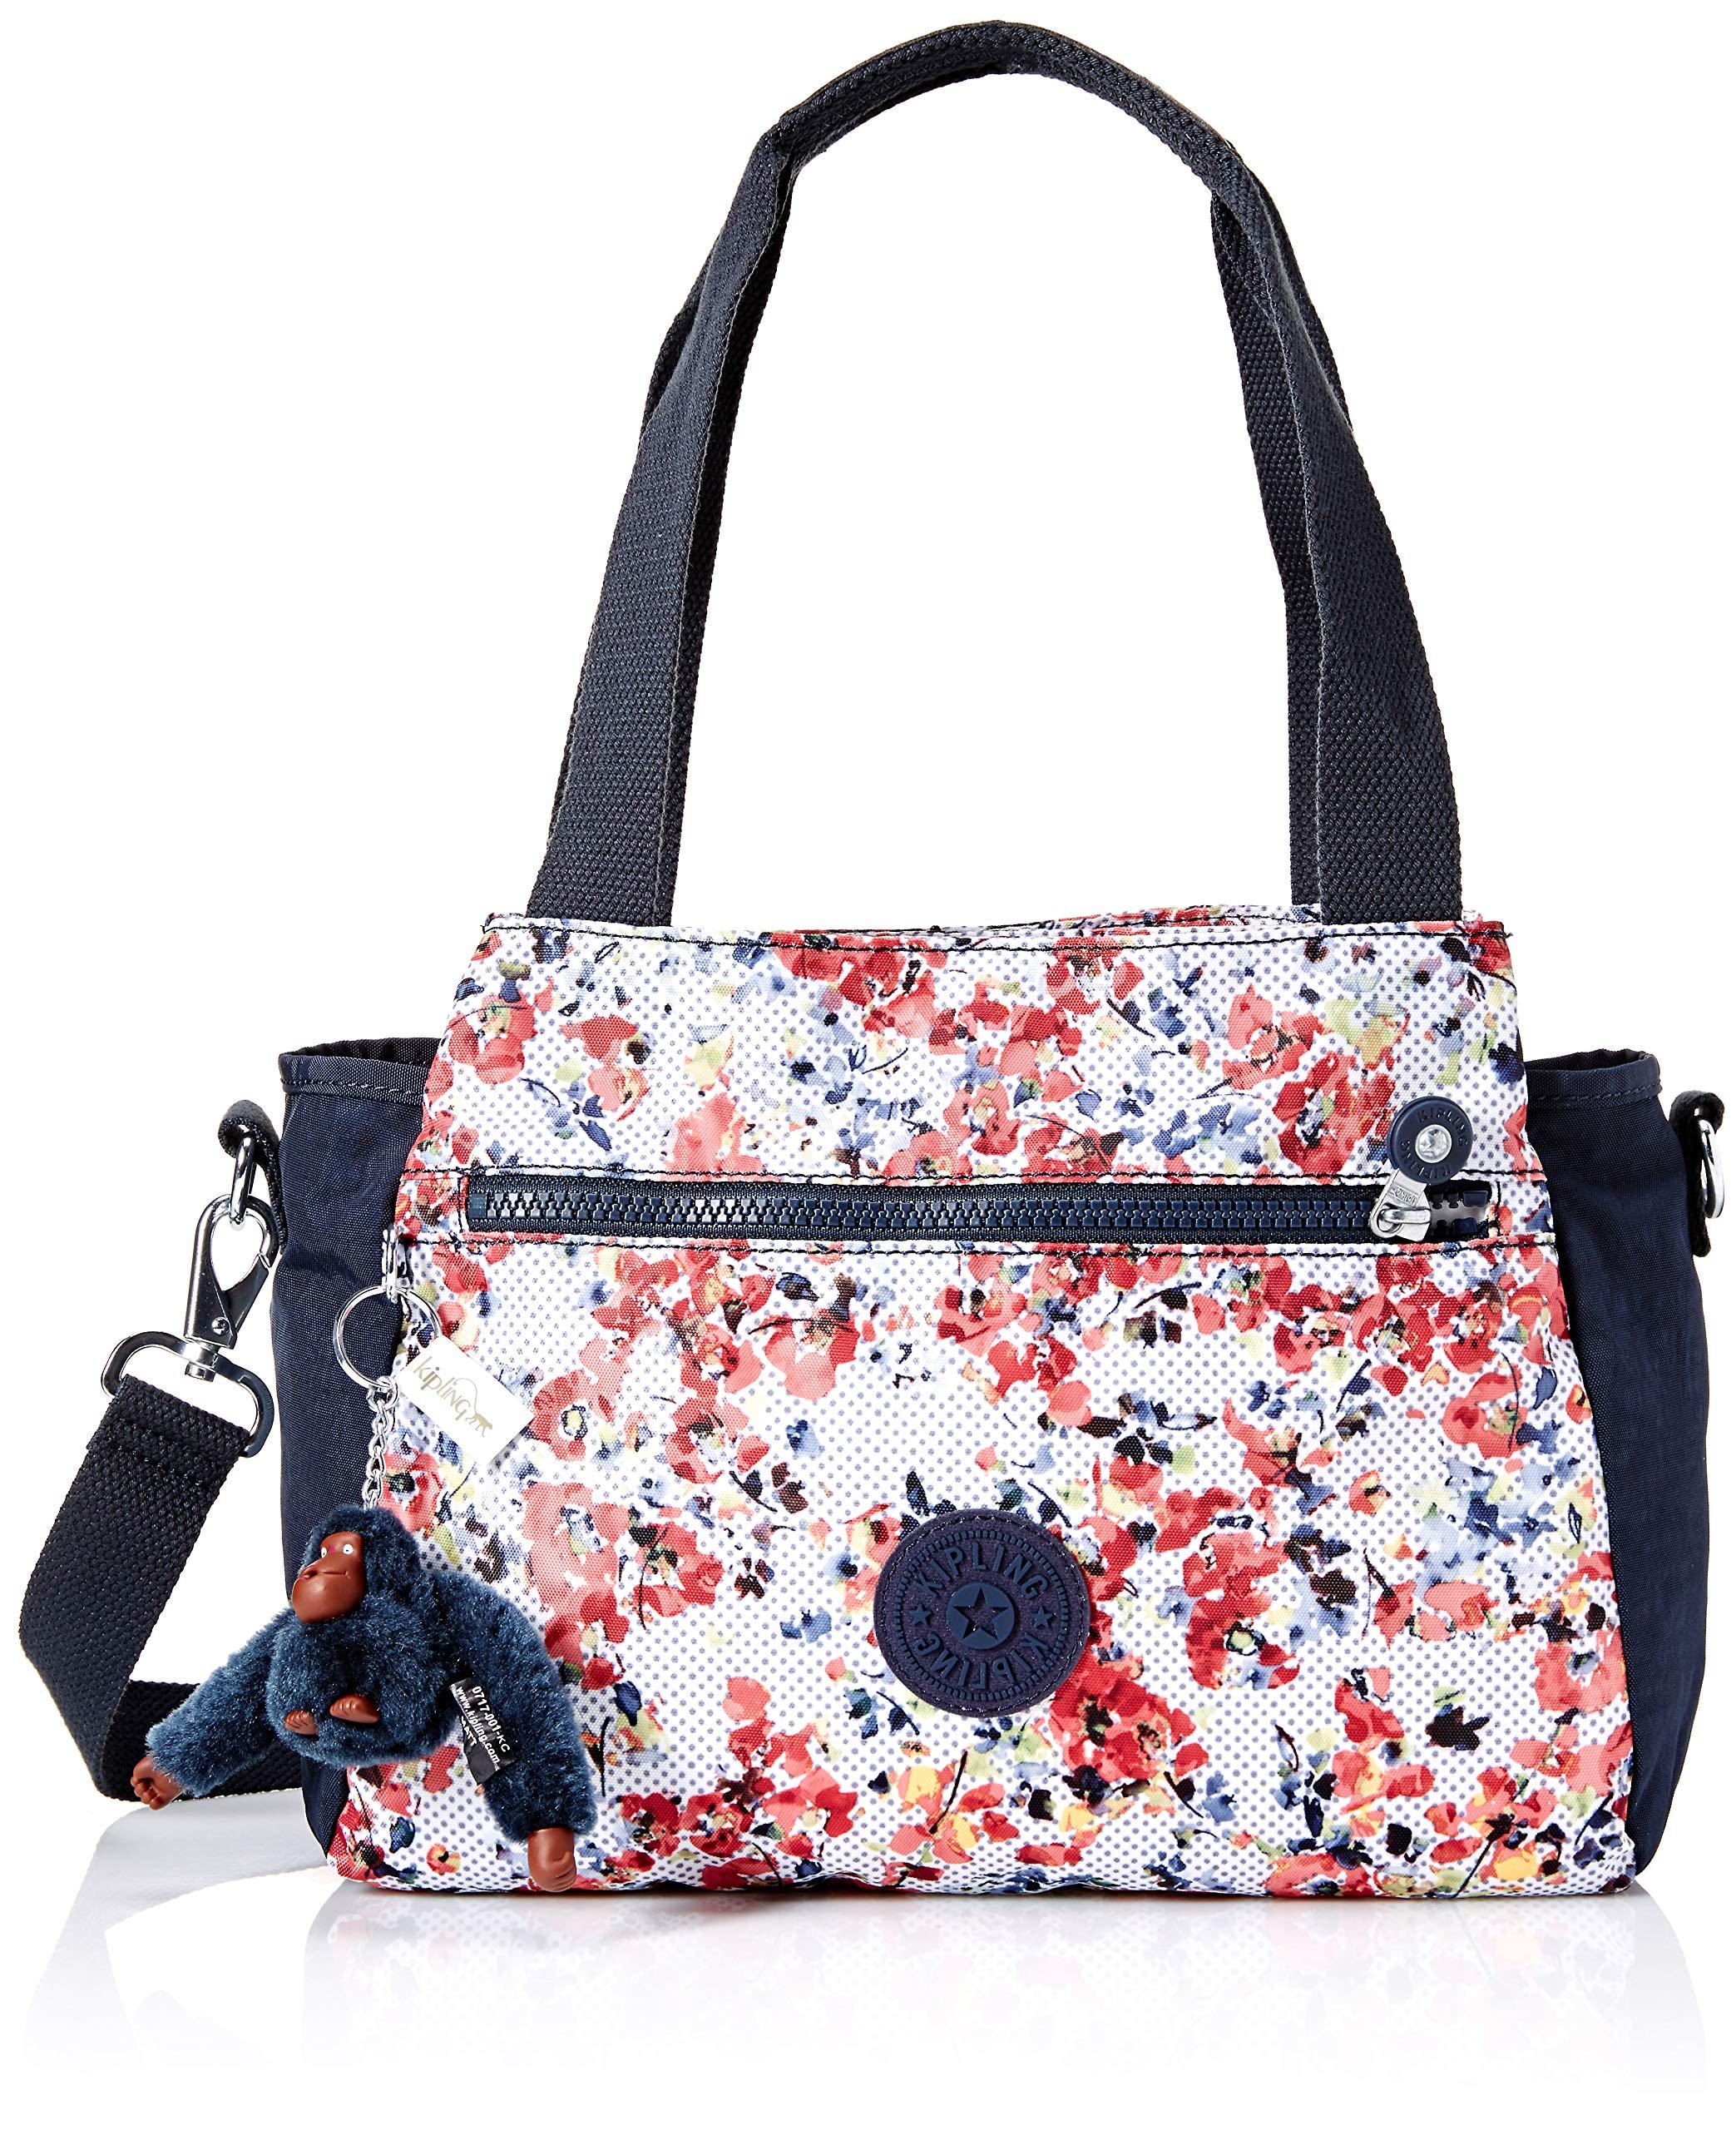 Kipling Elysia Printed Handbag, Busy Blossoms Blue Combo